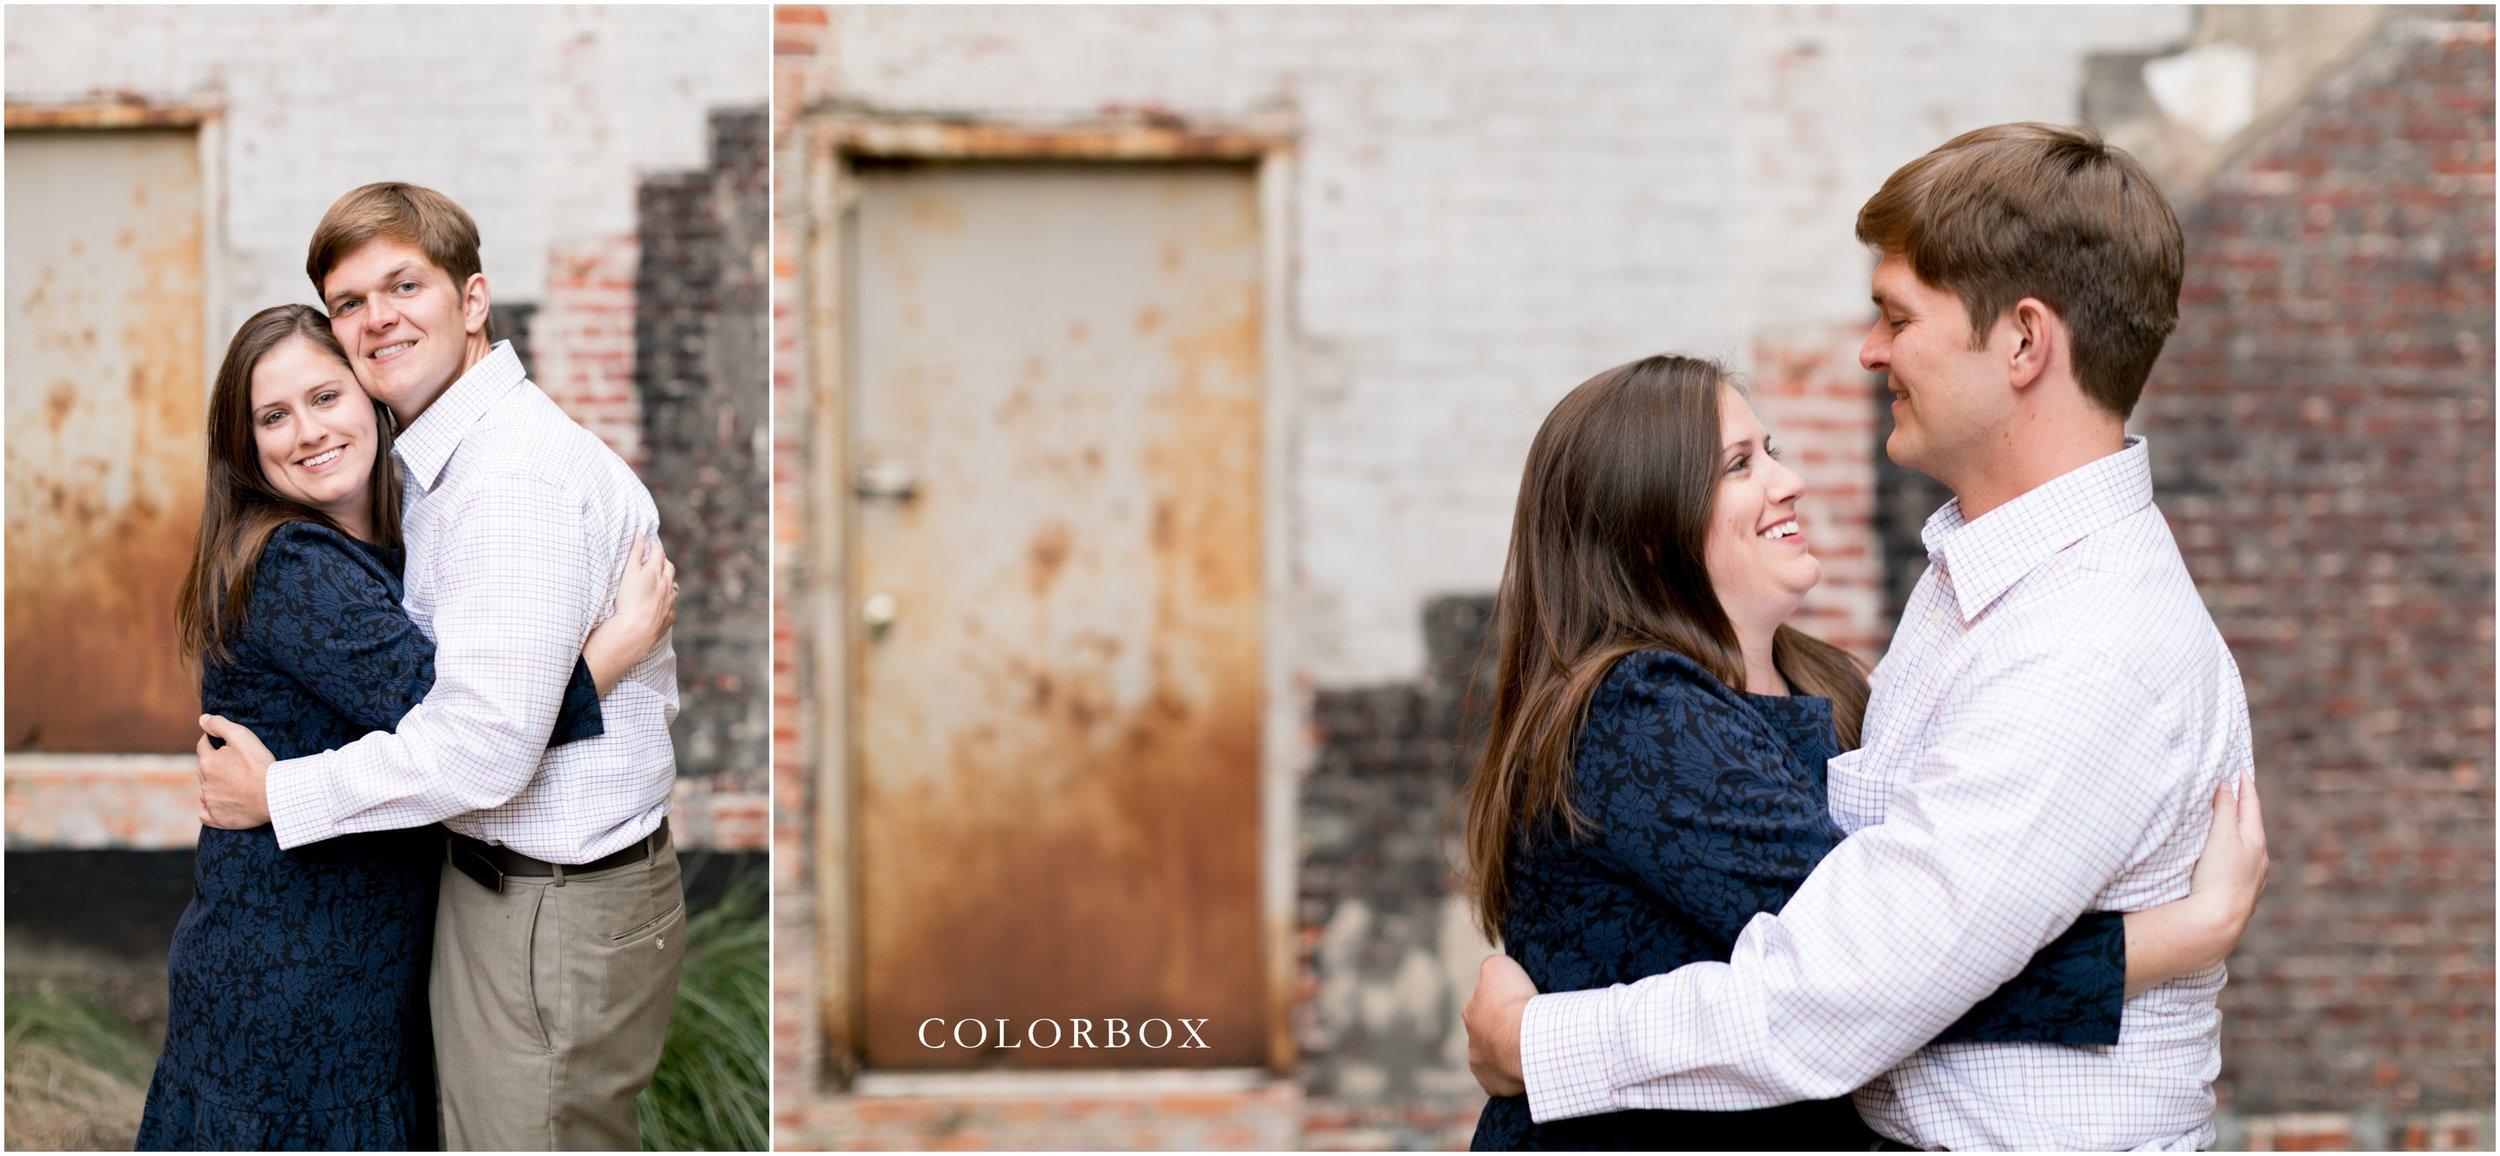 colorboxphotographers_6392.jpg